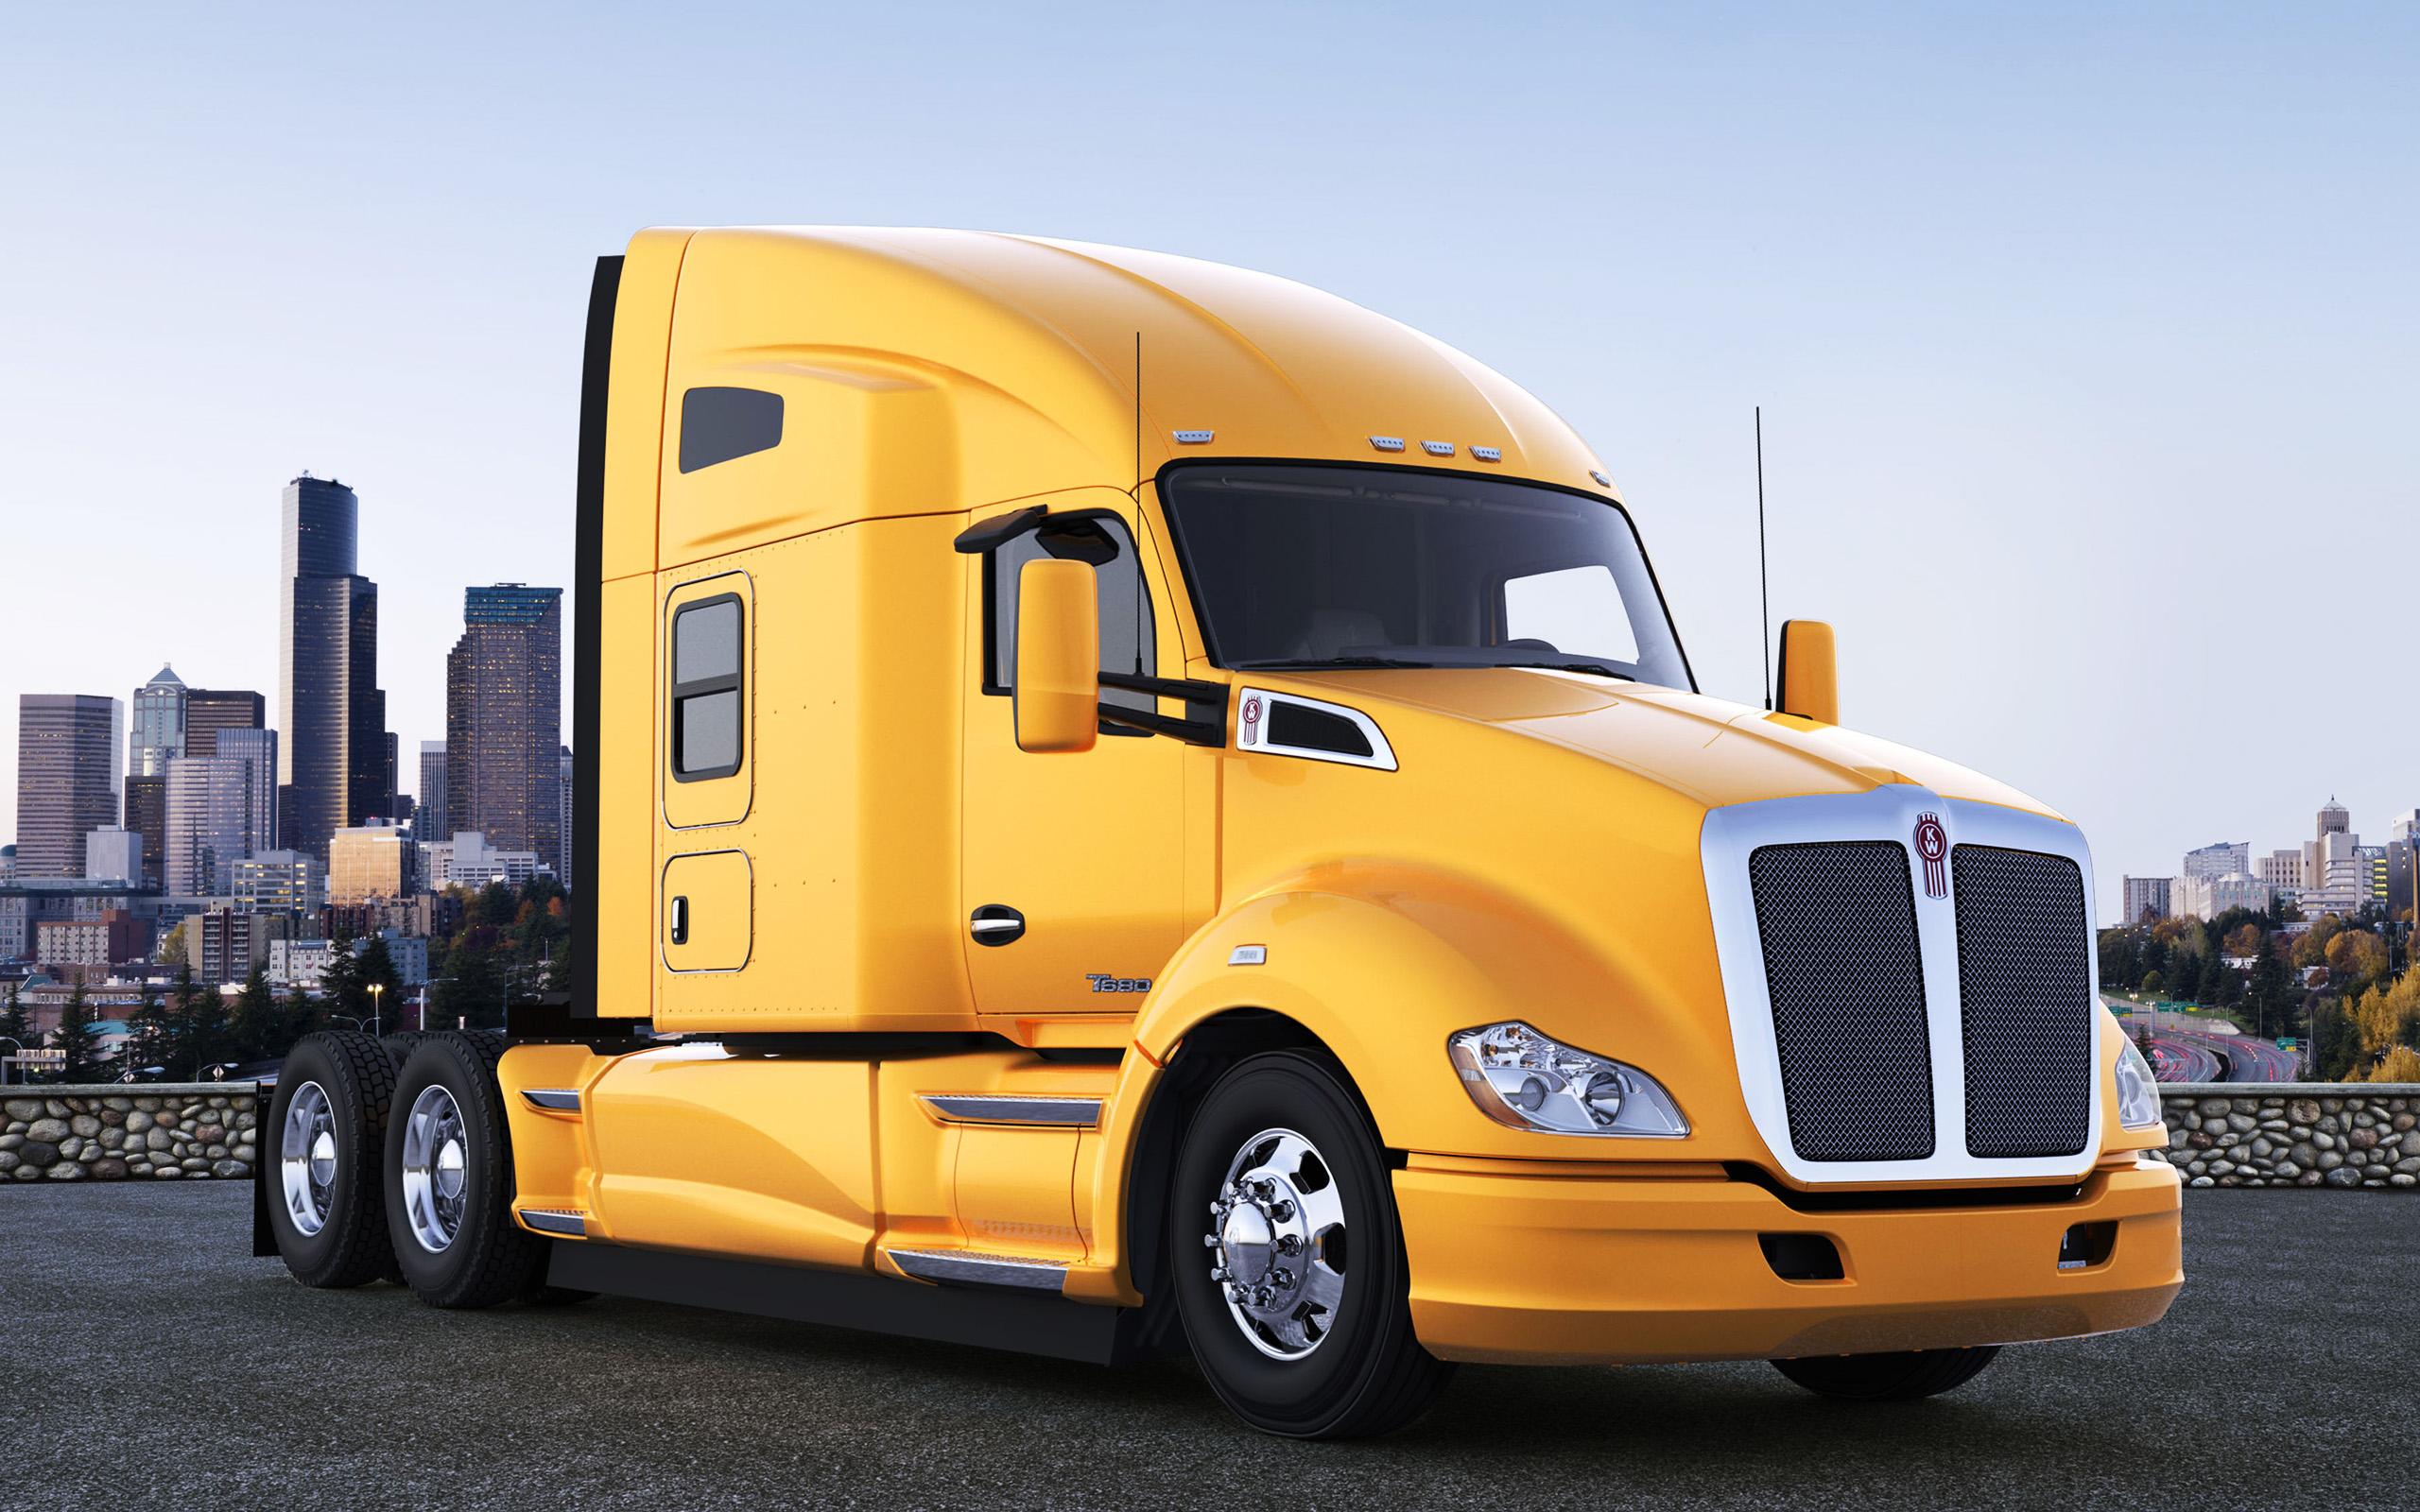 американские грузовики все модели фото свое название